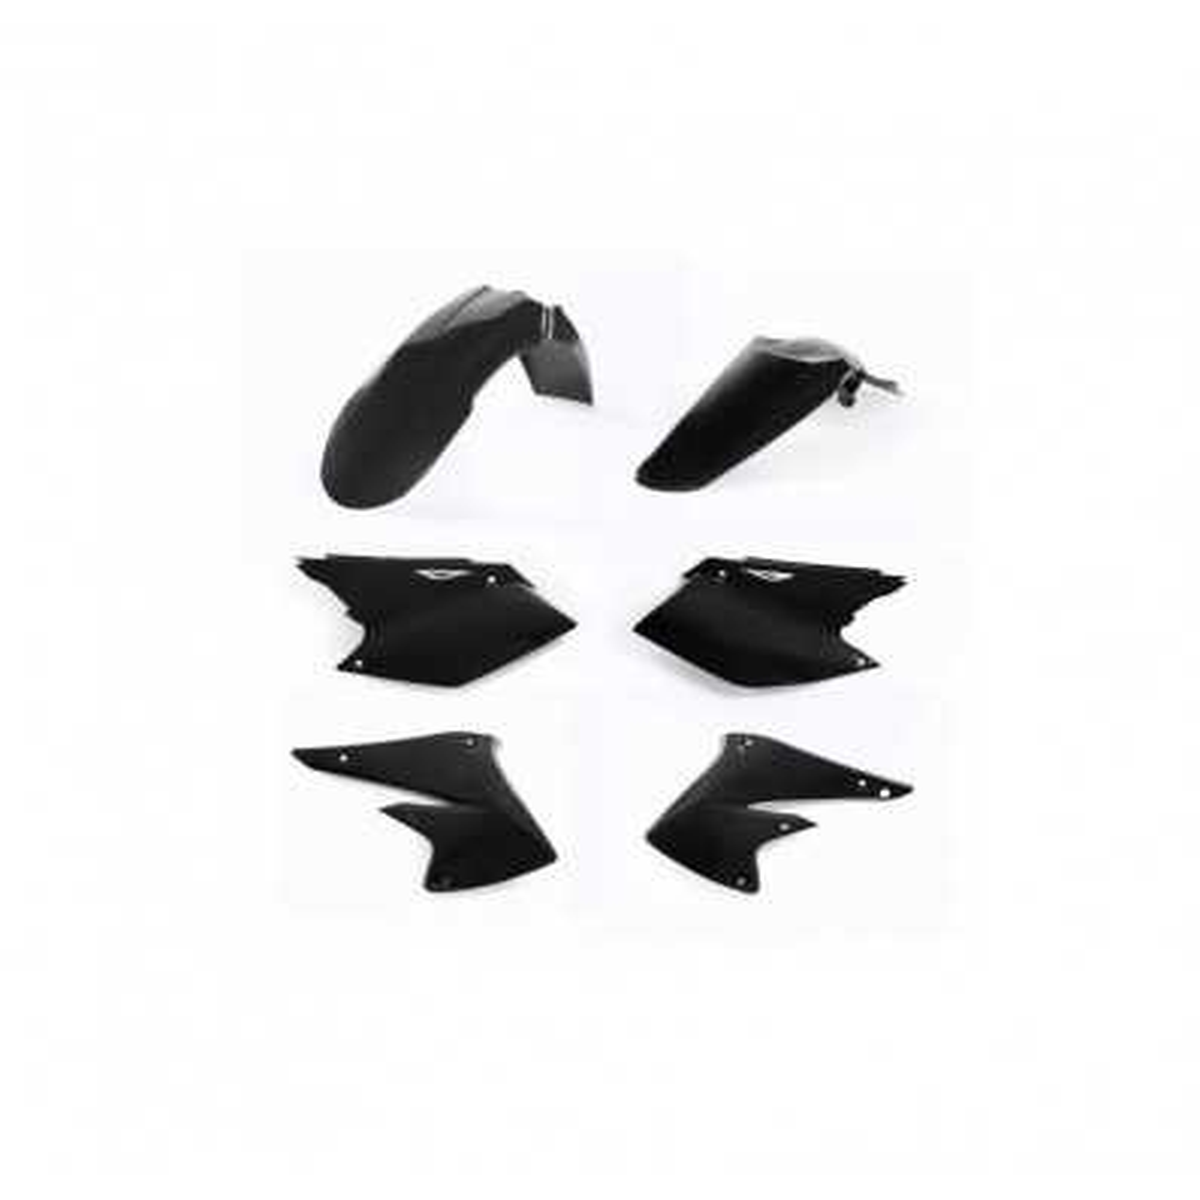 0007527-090 - Kit Plasticos Crf450 02 03 Negro